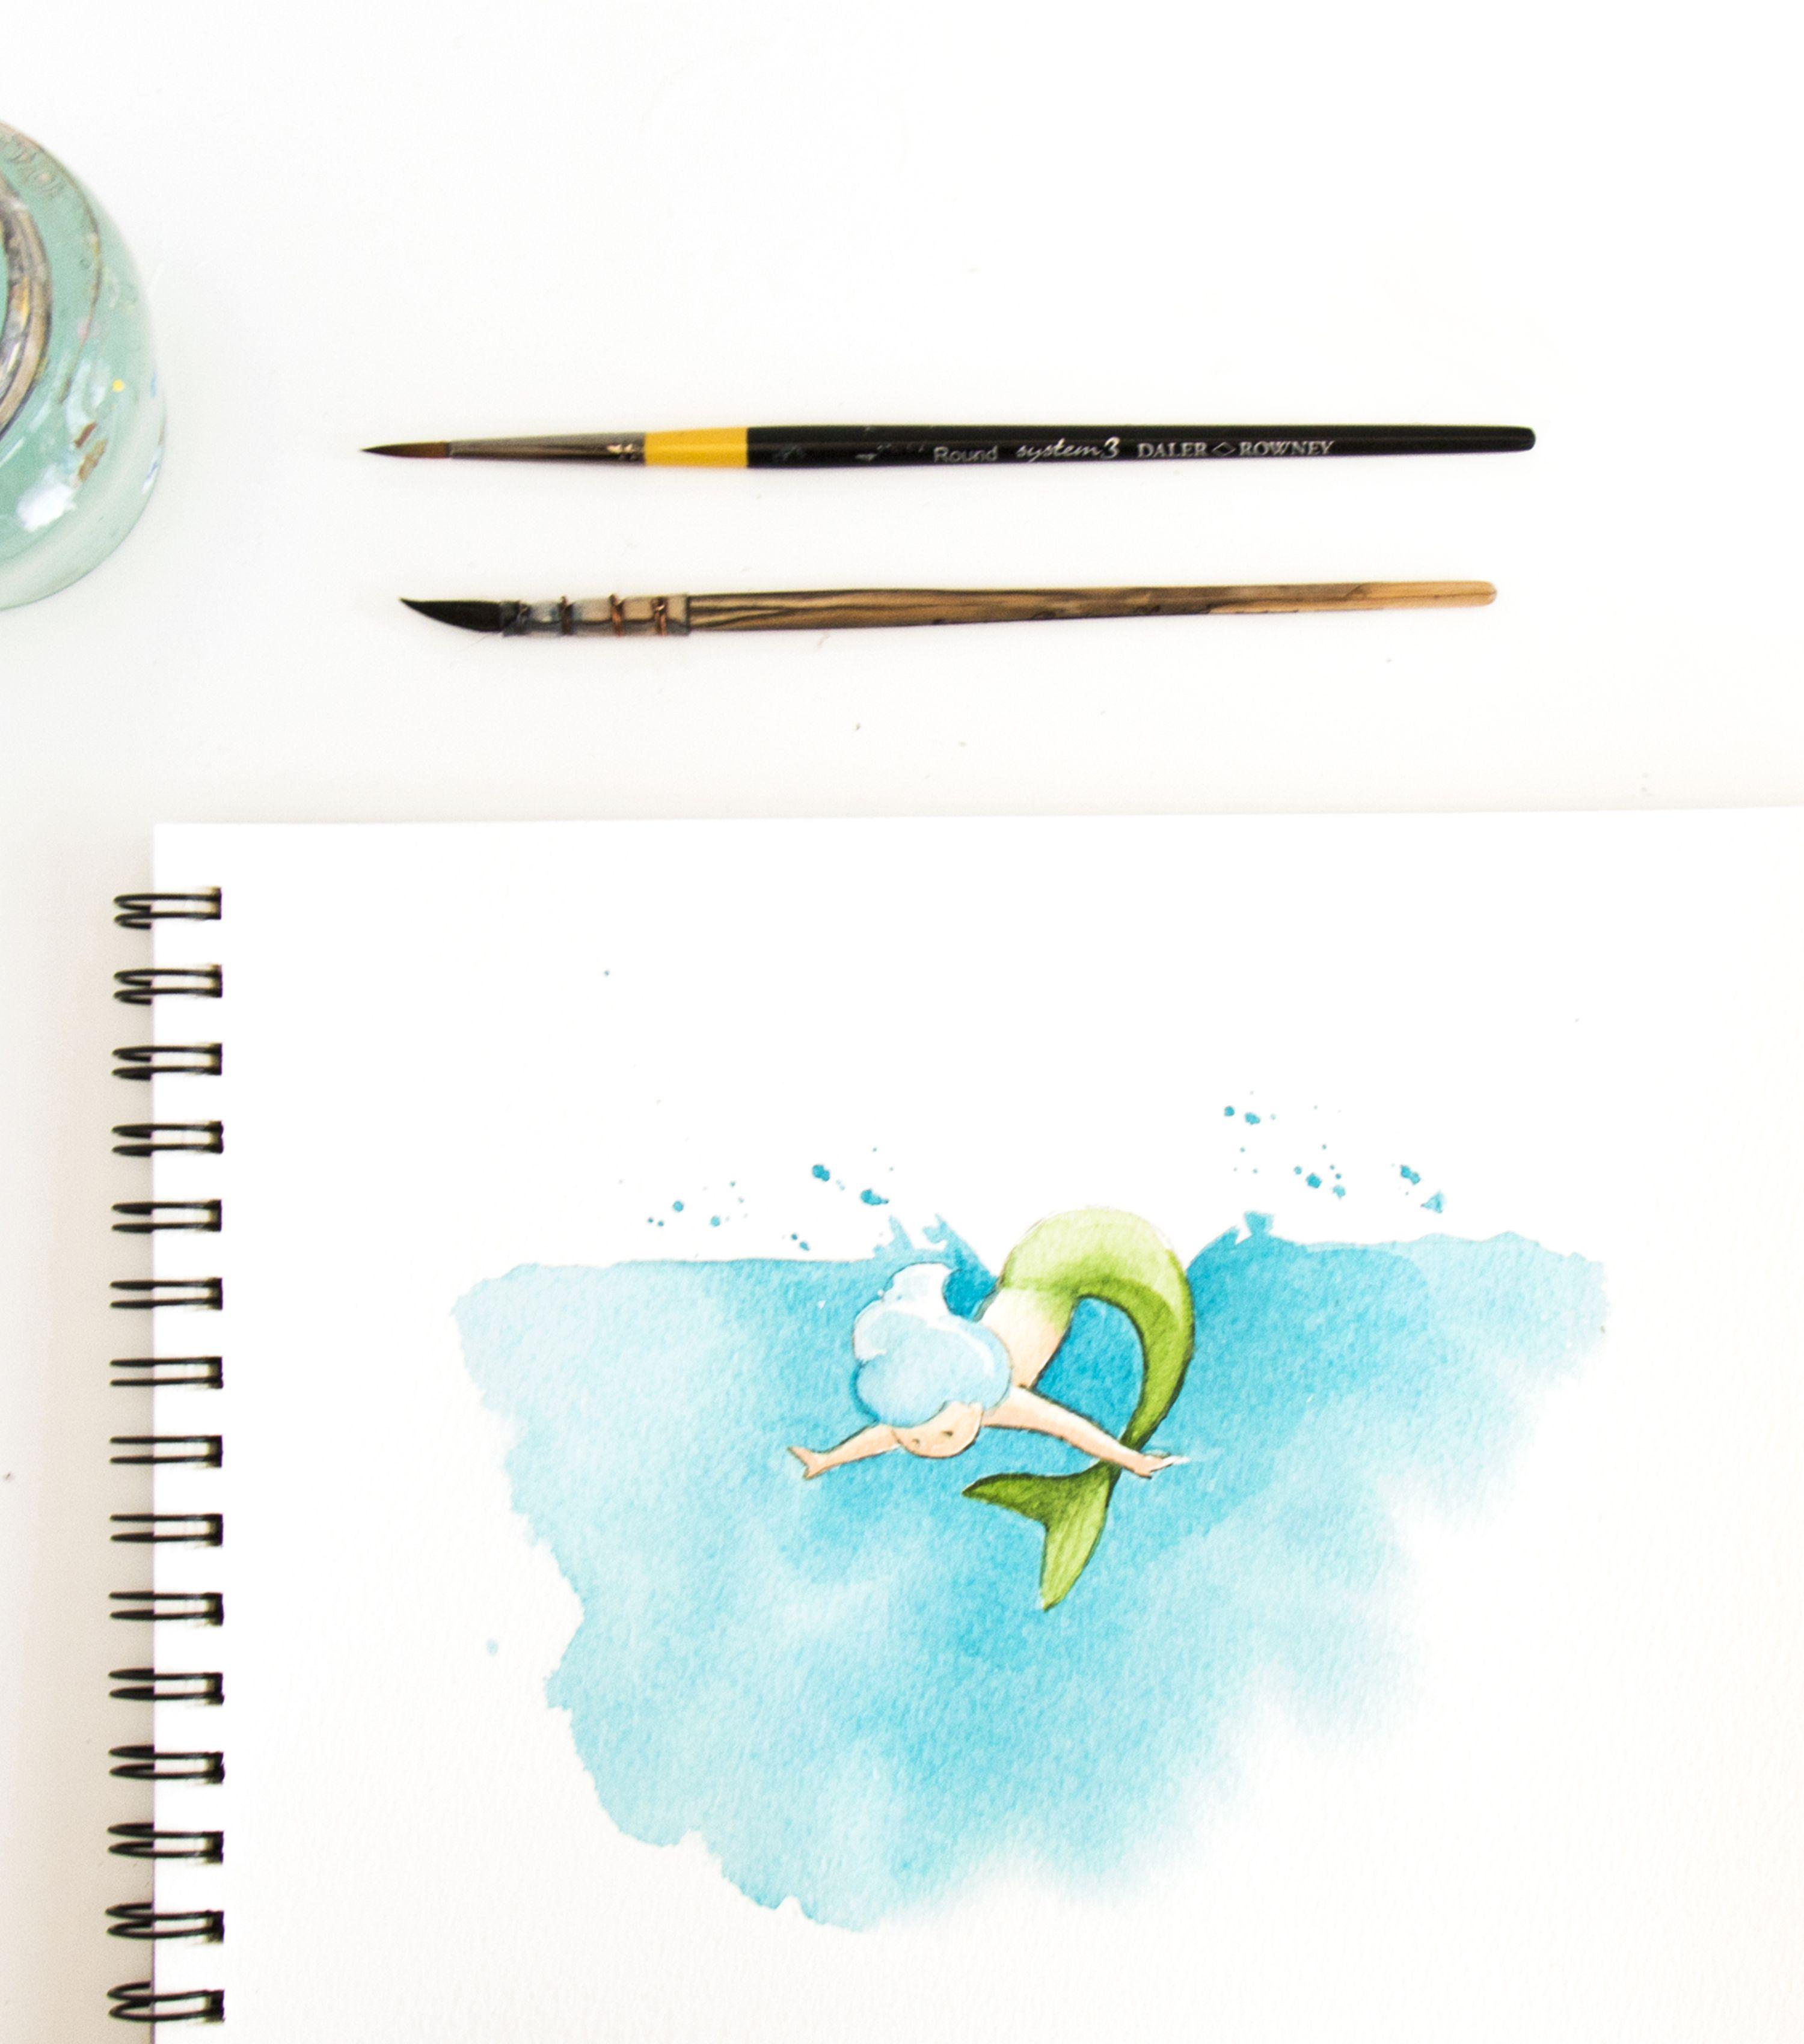 Mermaid Watercolor Illustration Sketchinc Watercolor Mermaid